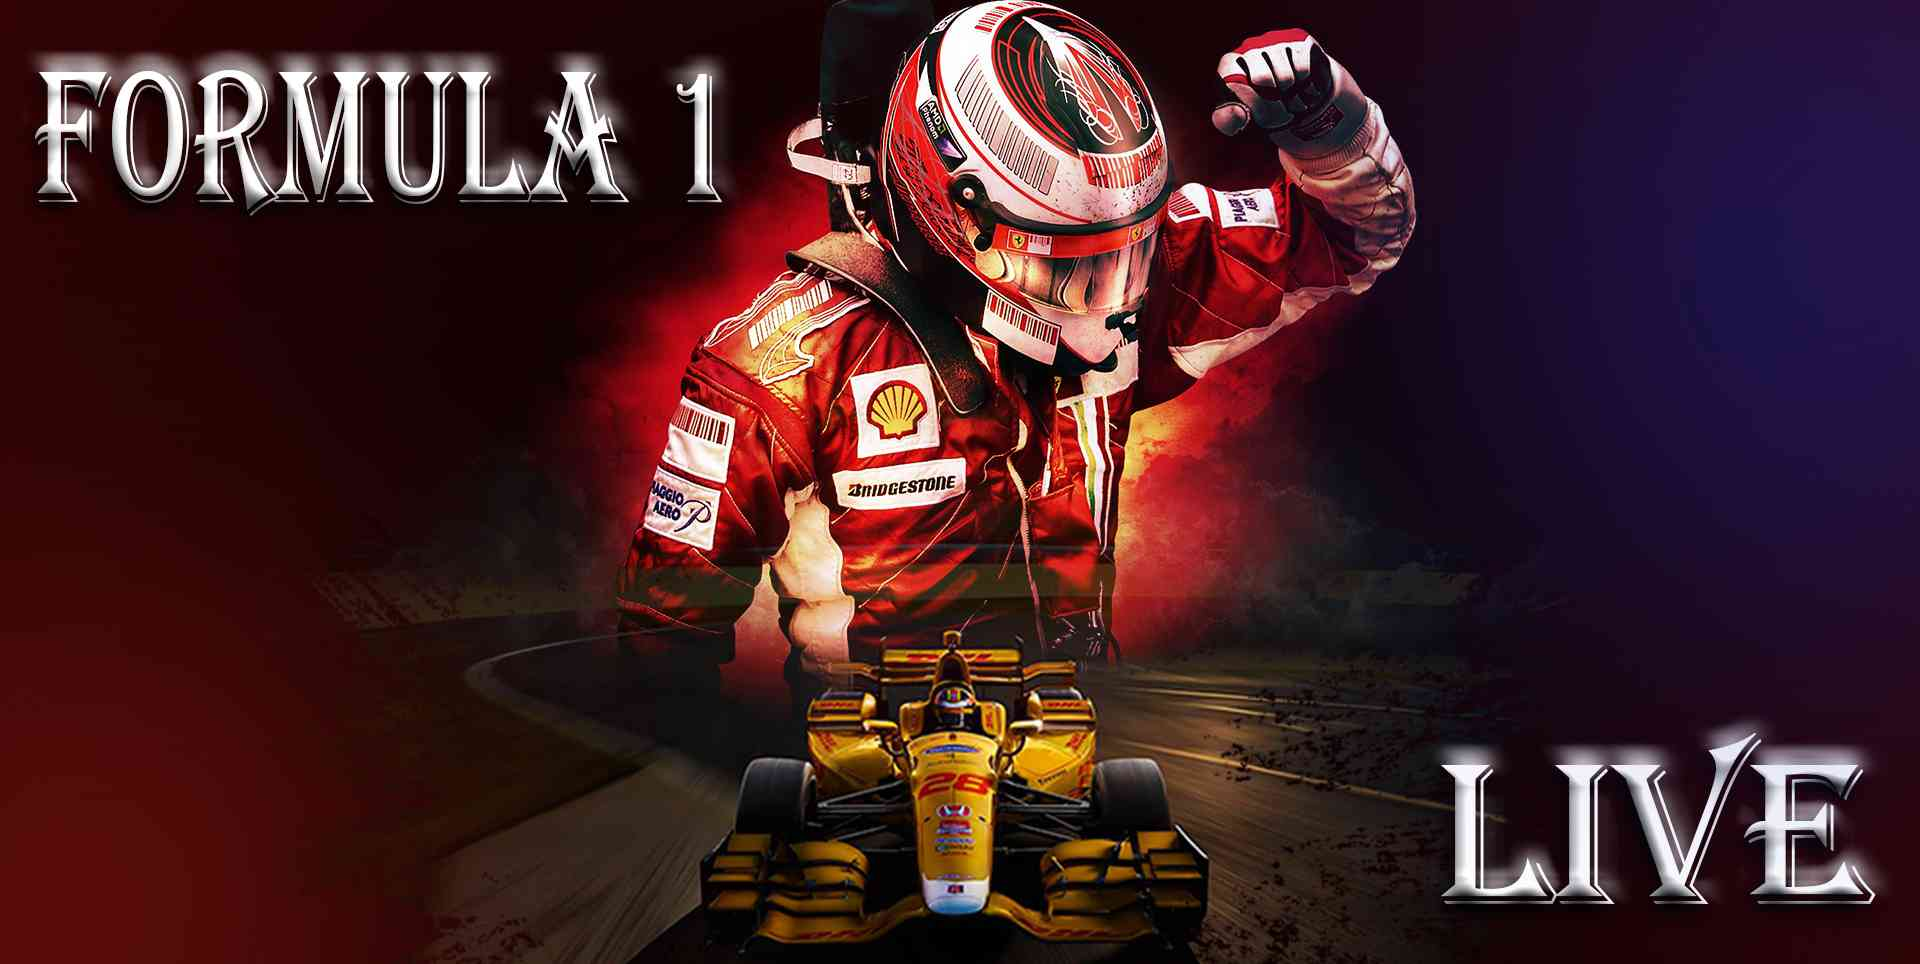 F1 Azerbaijan Grand Prix Live at the Baku City